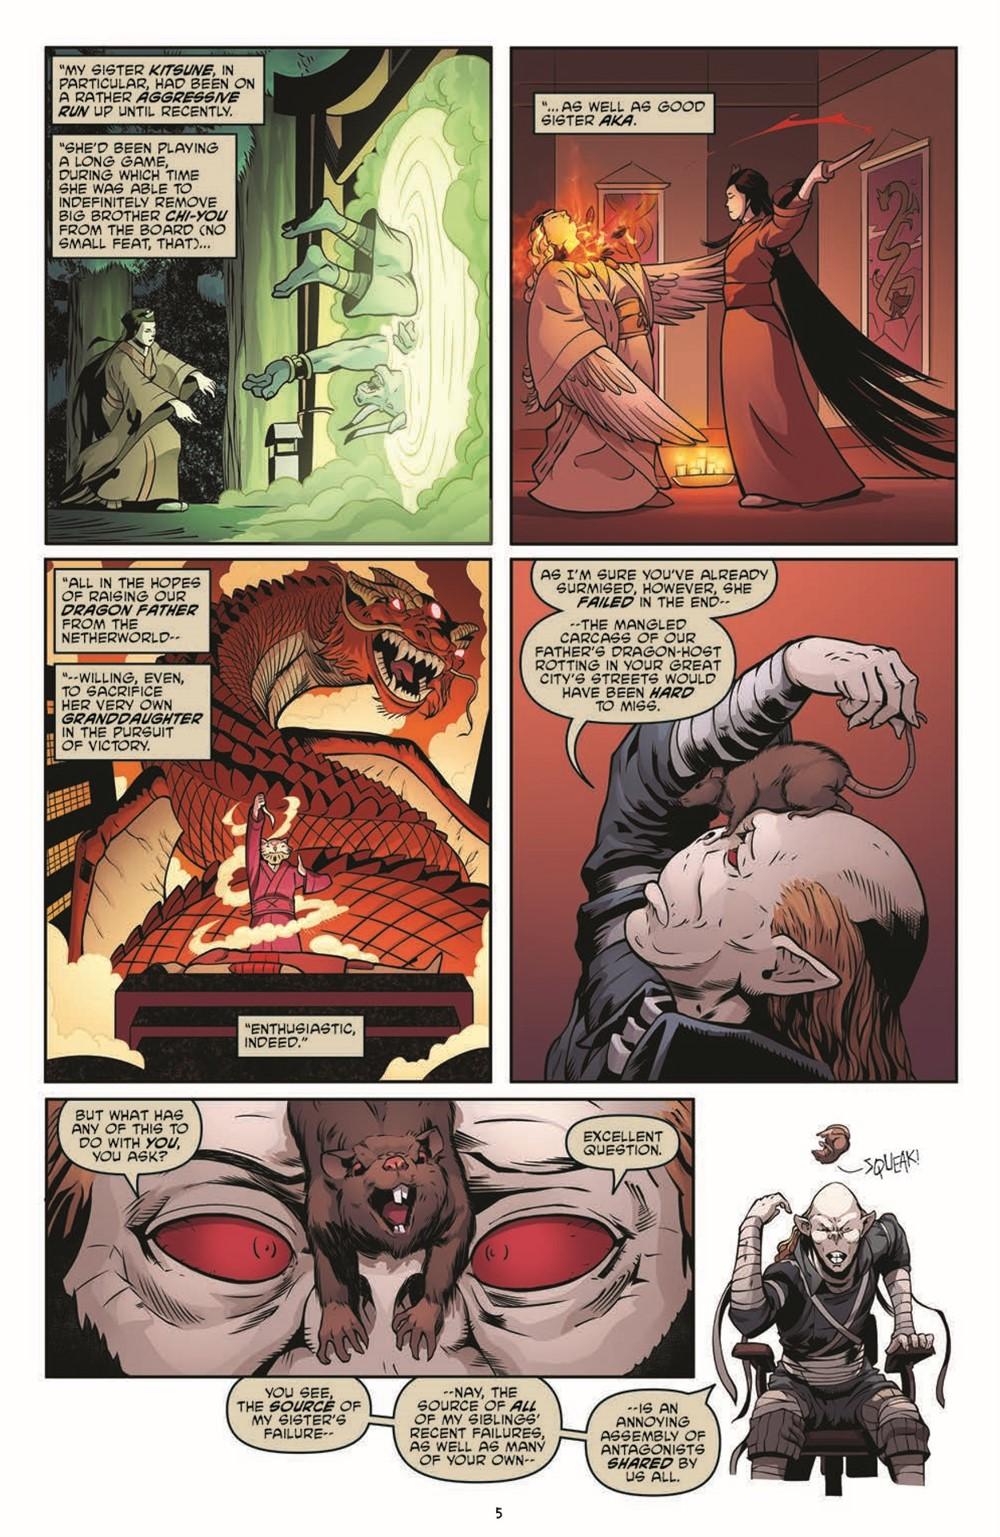 TMNT-Annual2021_pr-7 ComicList Previews: TEENAGE MUTANT NINJA TURTLES ANNUAL 2021